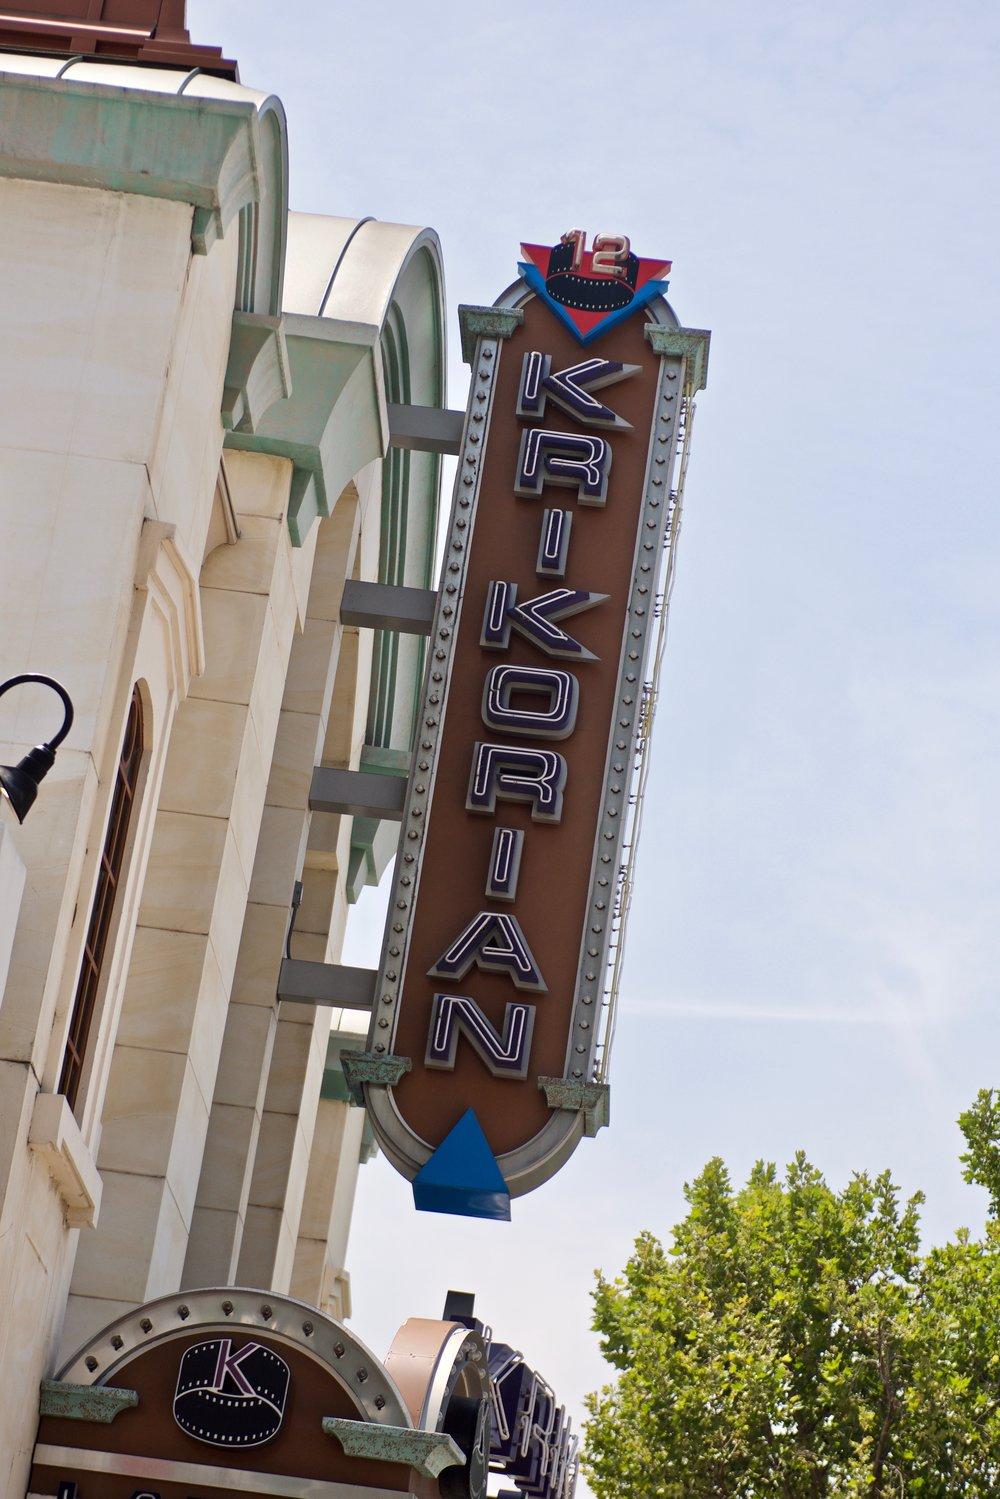 The Krikorian - 12 Screen Movie Theater